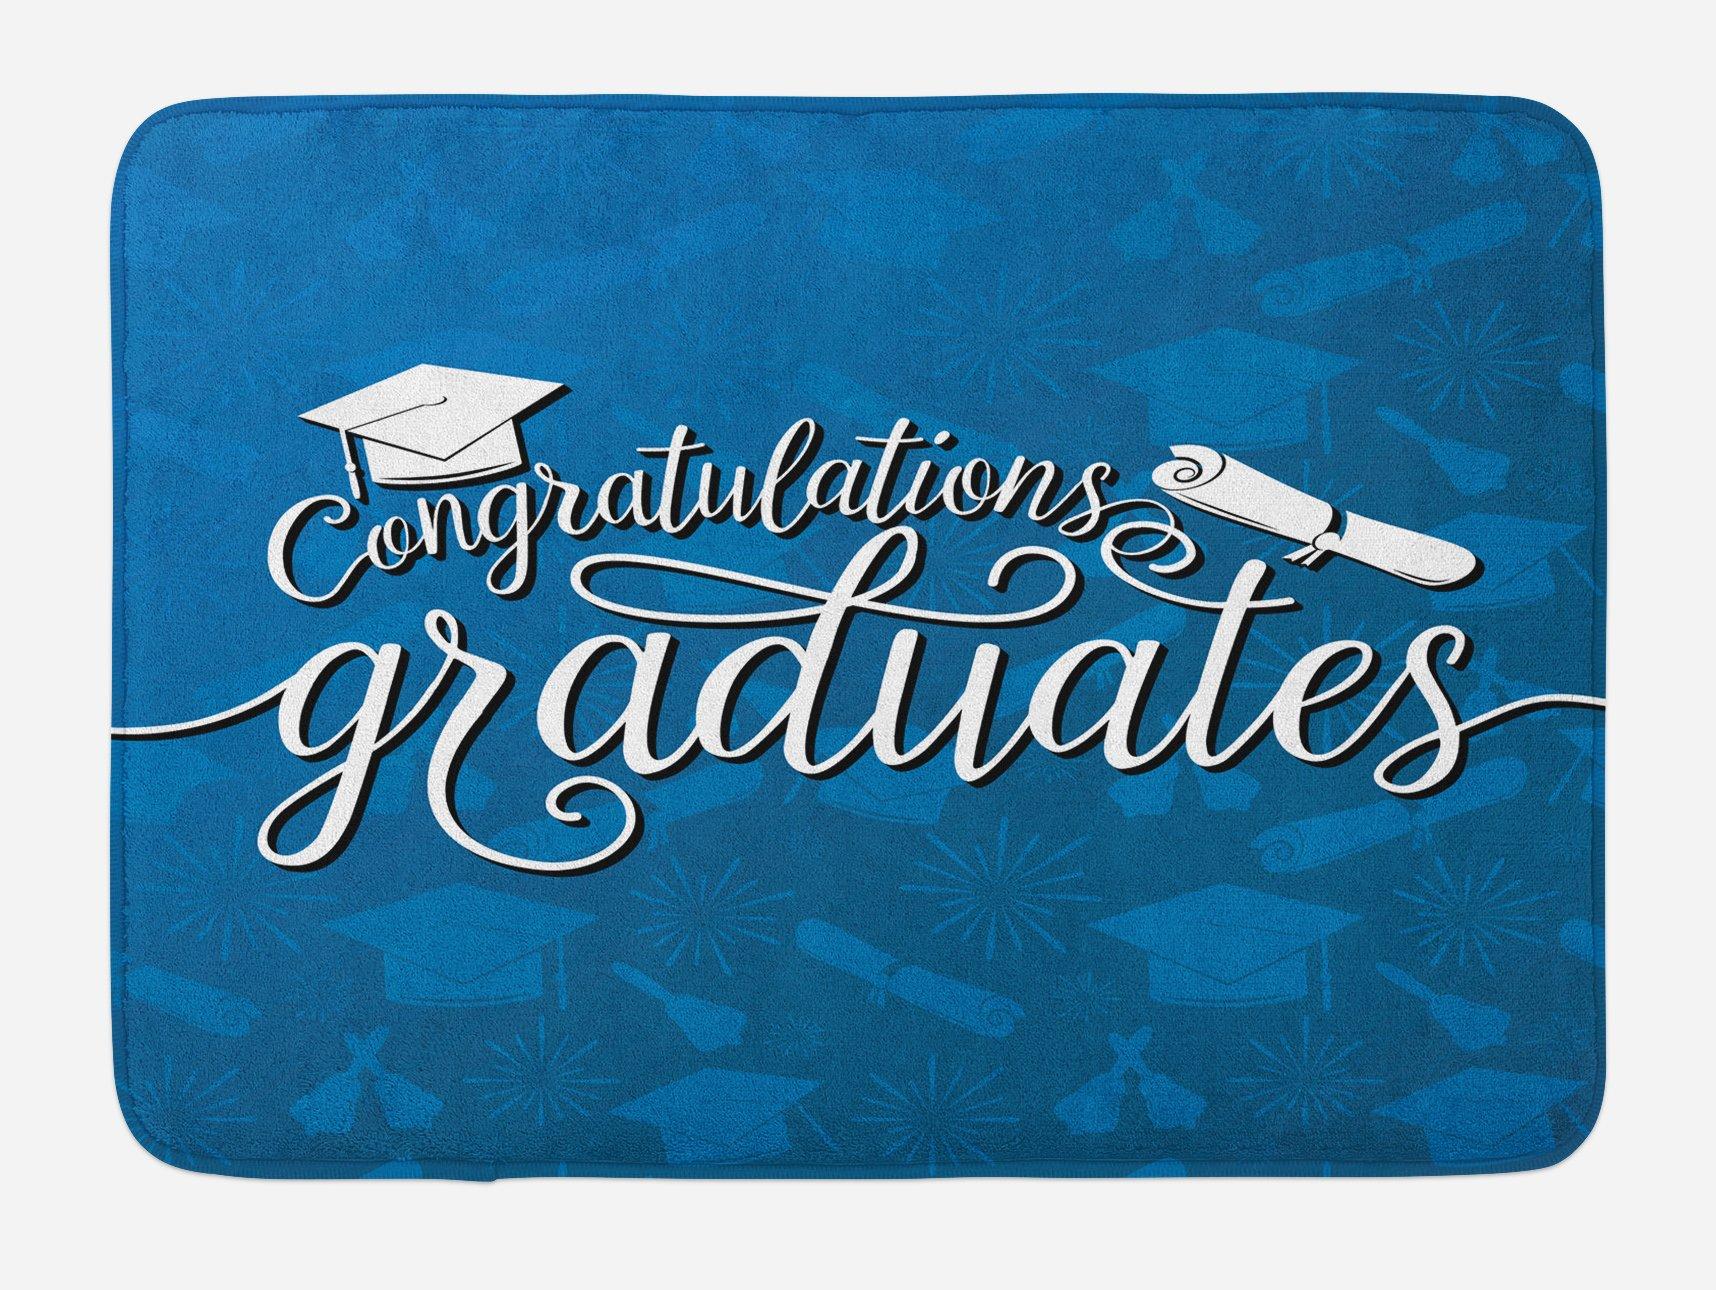 Lunarable Graduation Bath Mat, College Celebration Ceremony Certificate Diploma Square Academic Cap Print, Plush Bathroom Decor Mat with Non Slip Backing, 29.5 W X 17.5 W Inches, Blue and White